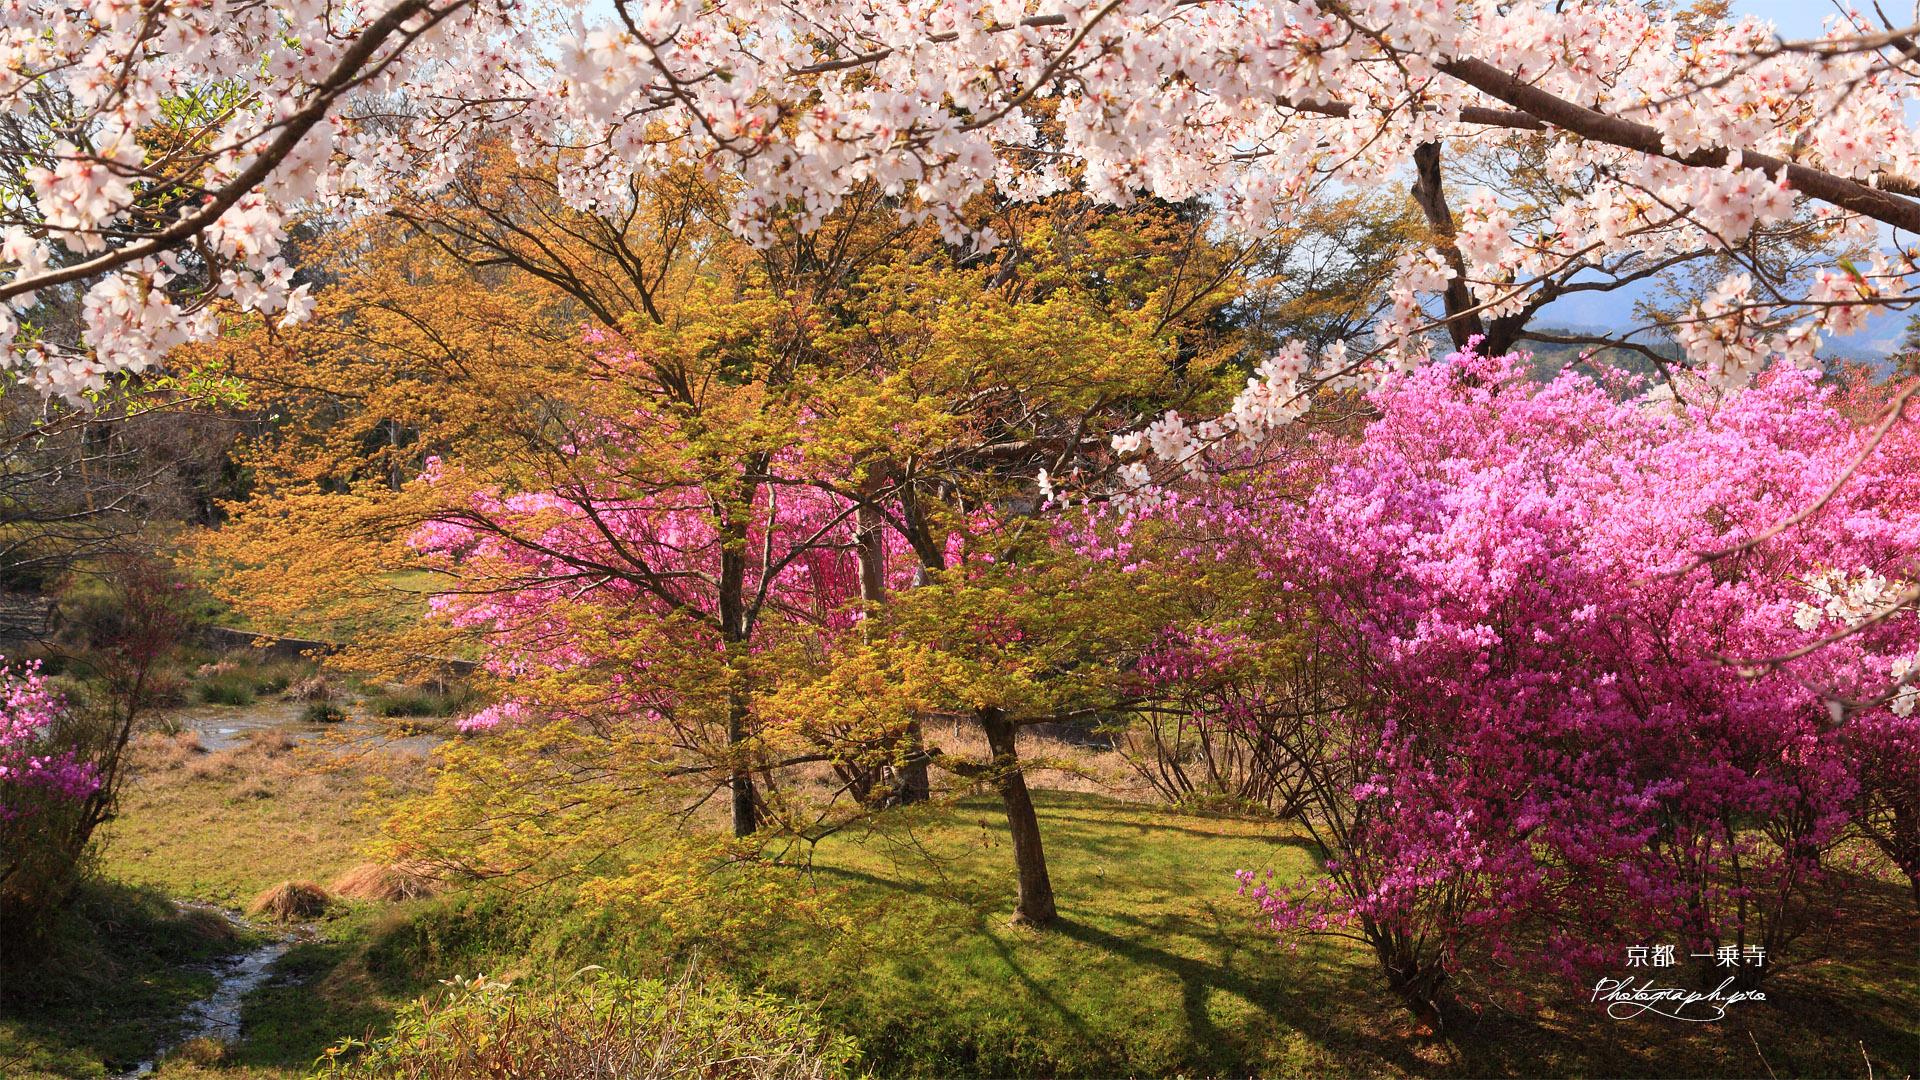 一乗寺 曼殊院の桜と三葉躑躅